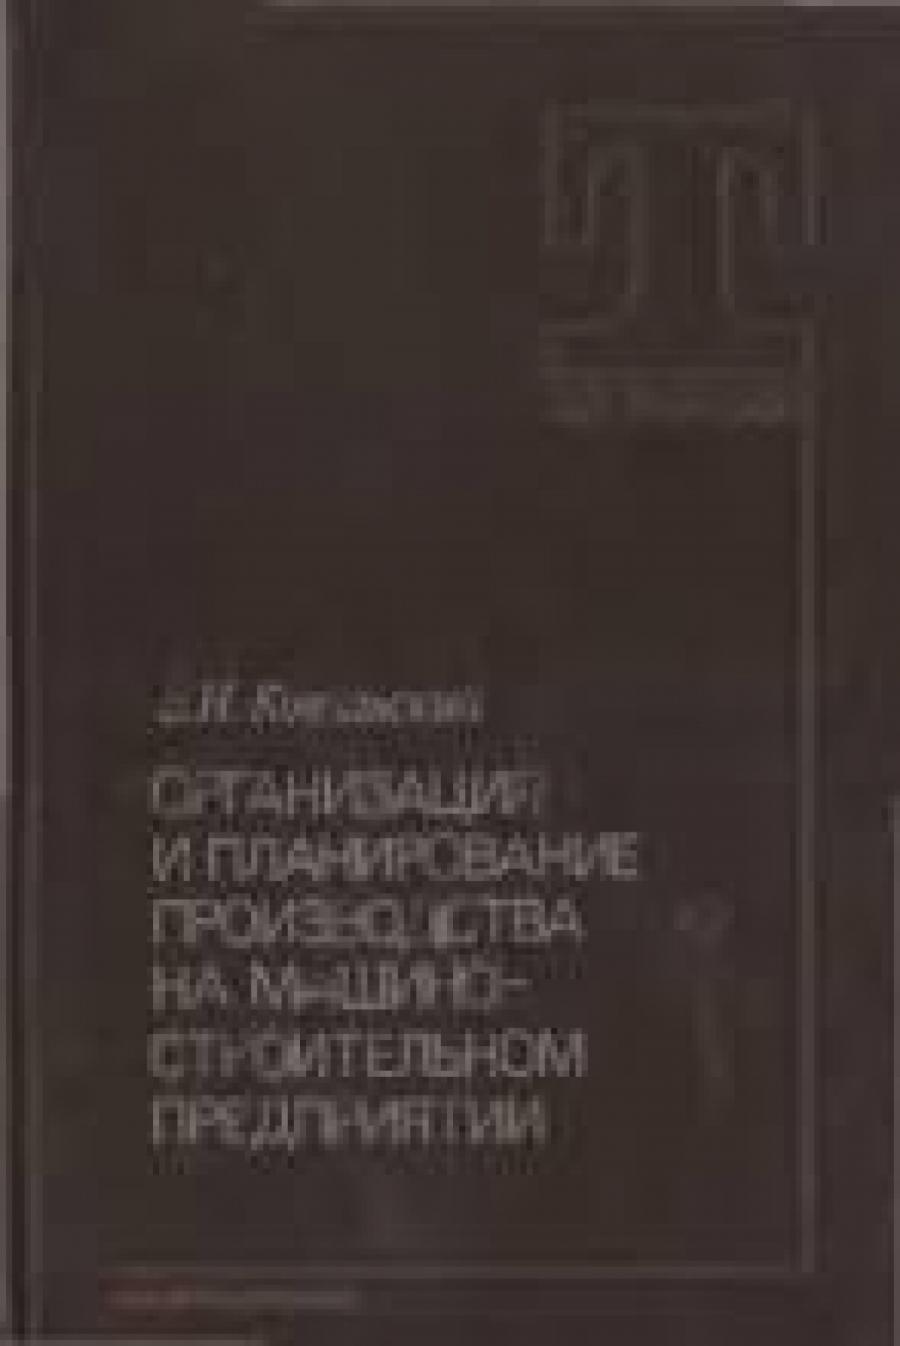 Обложка книги:  ковальский в. и. - организация и планирование пр-ва на машиностроит. предприятии